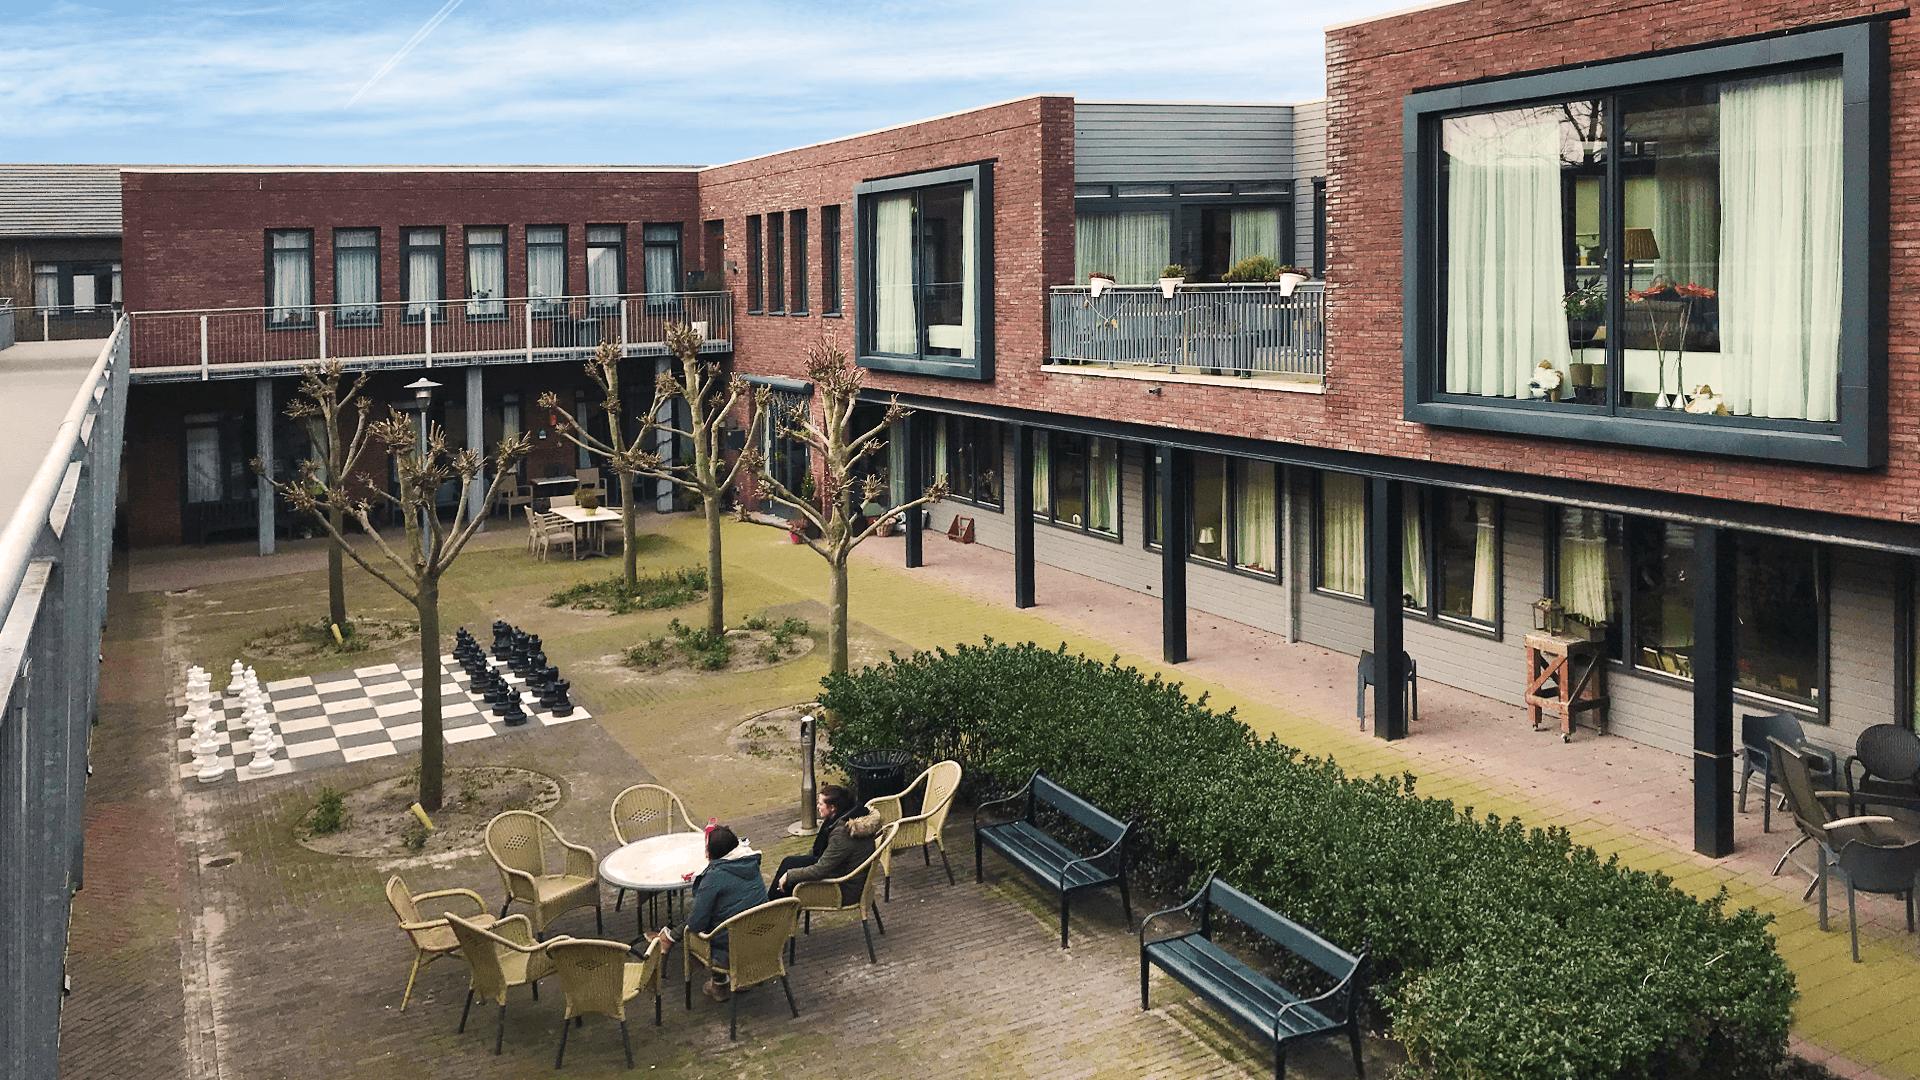 Hogeweyk - Netherlands